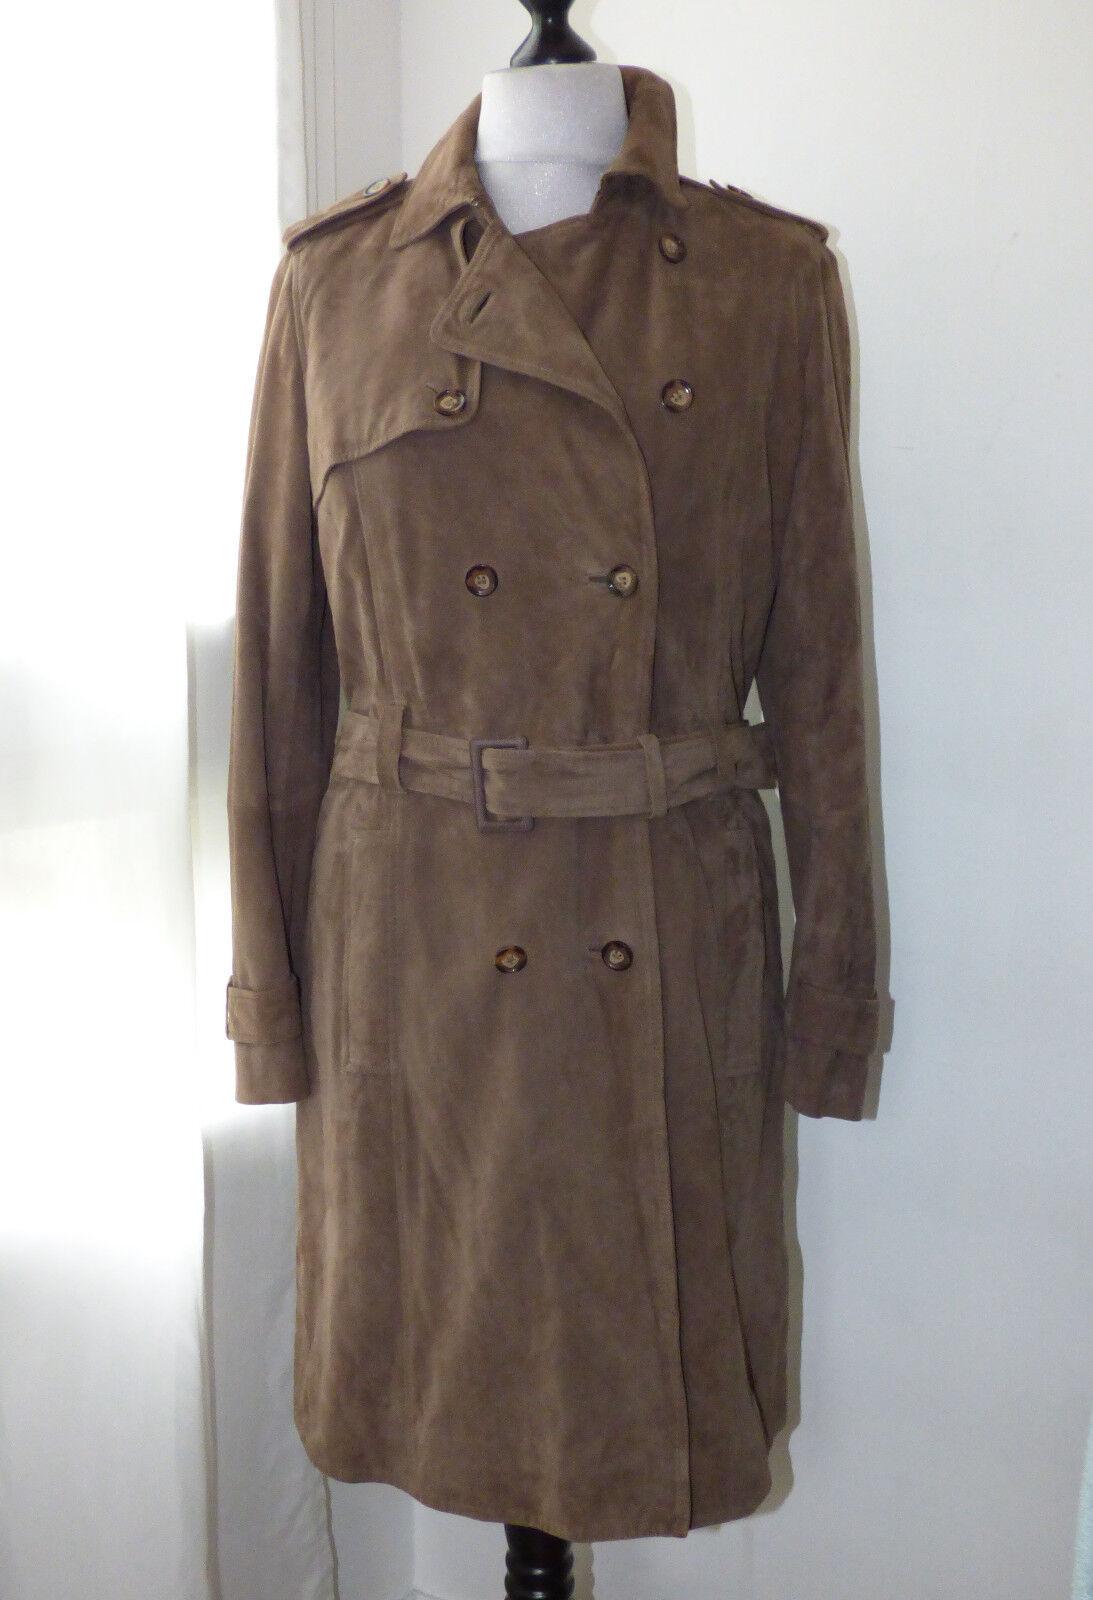 Manteau facon trench en cuir brown TARA JARMON prix initial